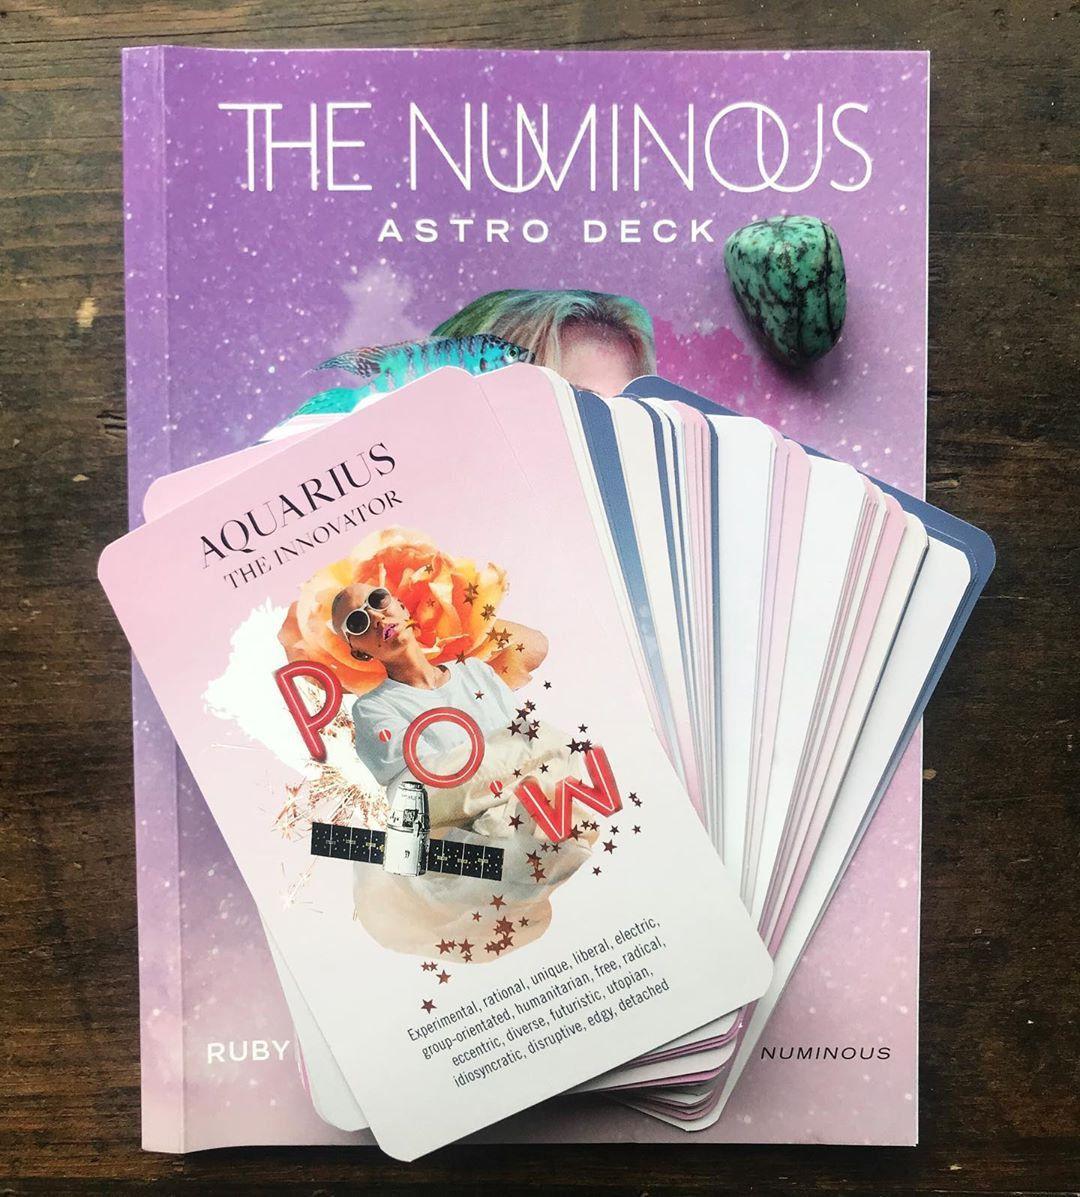 The Numinous Astro Deck By Newagegifts On Etsy Tarotcards Tarotdeck Divination Cartomancy Oraclecards Oracledeck Newagegi Oracle Cards Cartomancy Astro